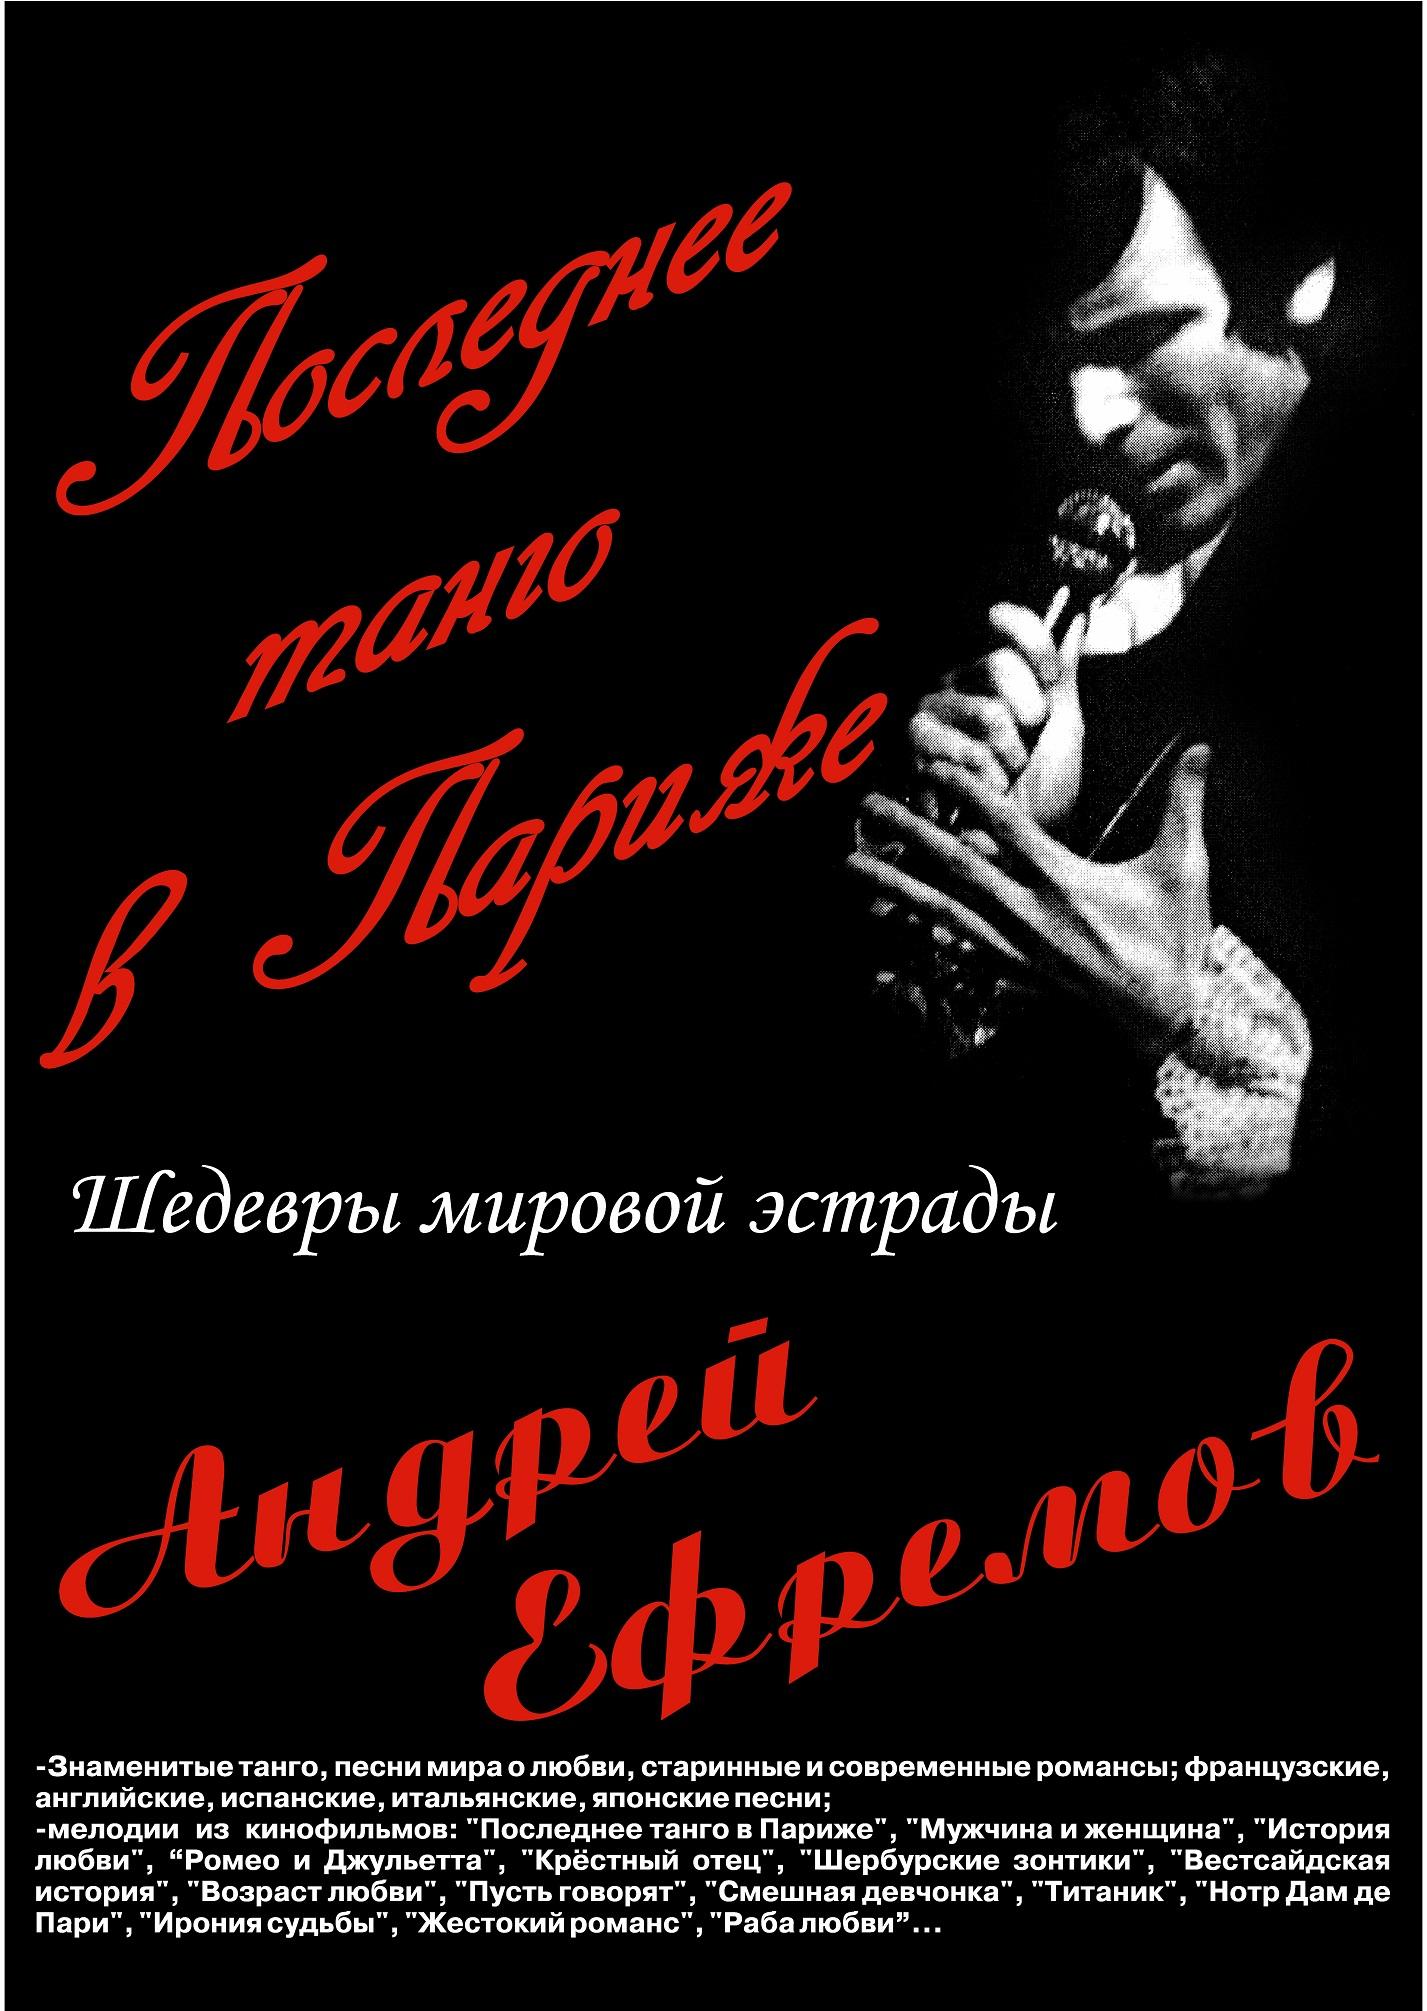 http://andreyefremov.ru/POSTERS/post2.jpg